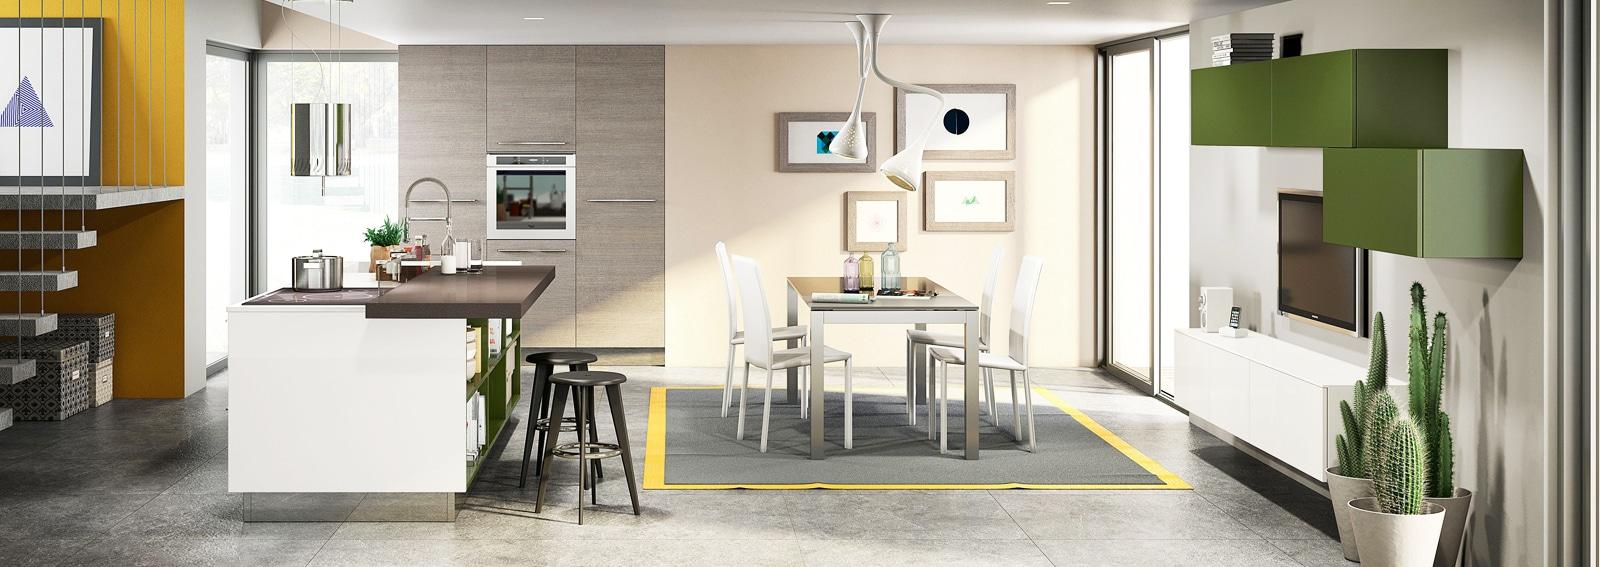 Berloni le cucine moderne pi belle - Berloni cucine moderne ...